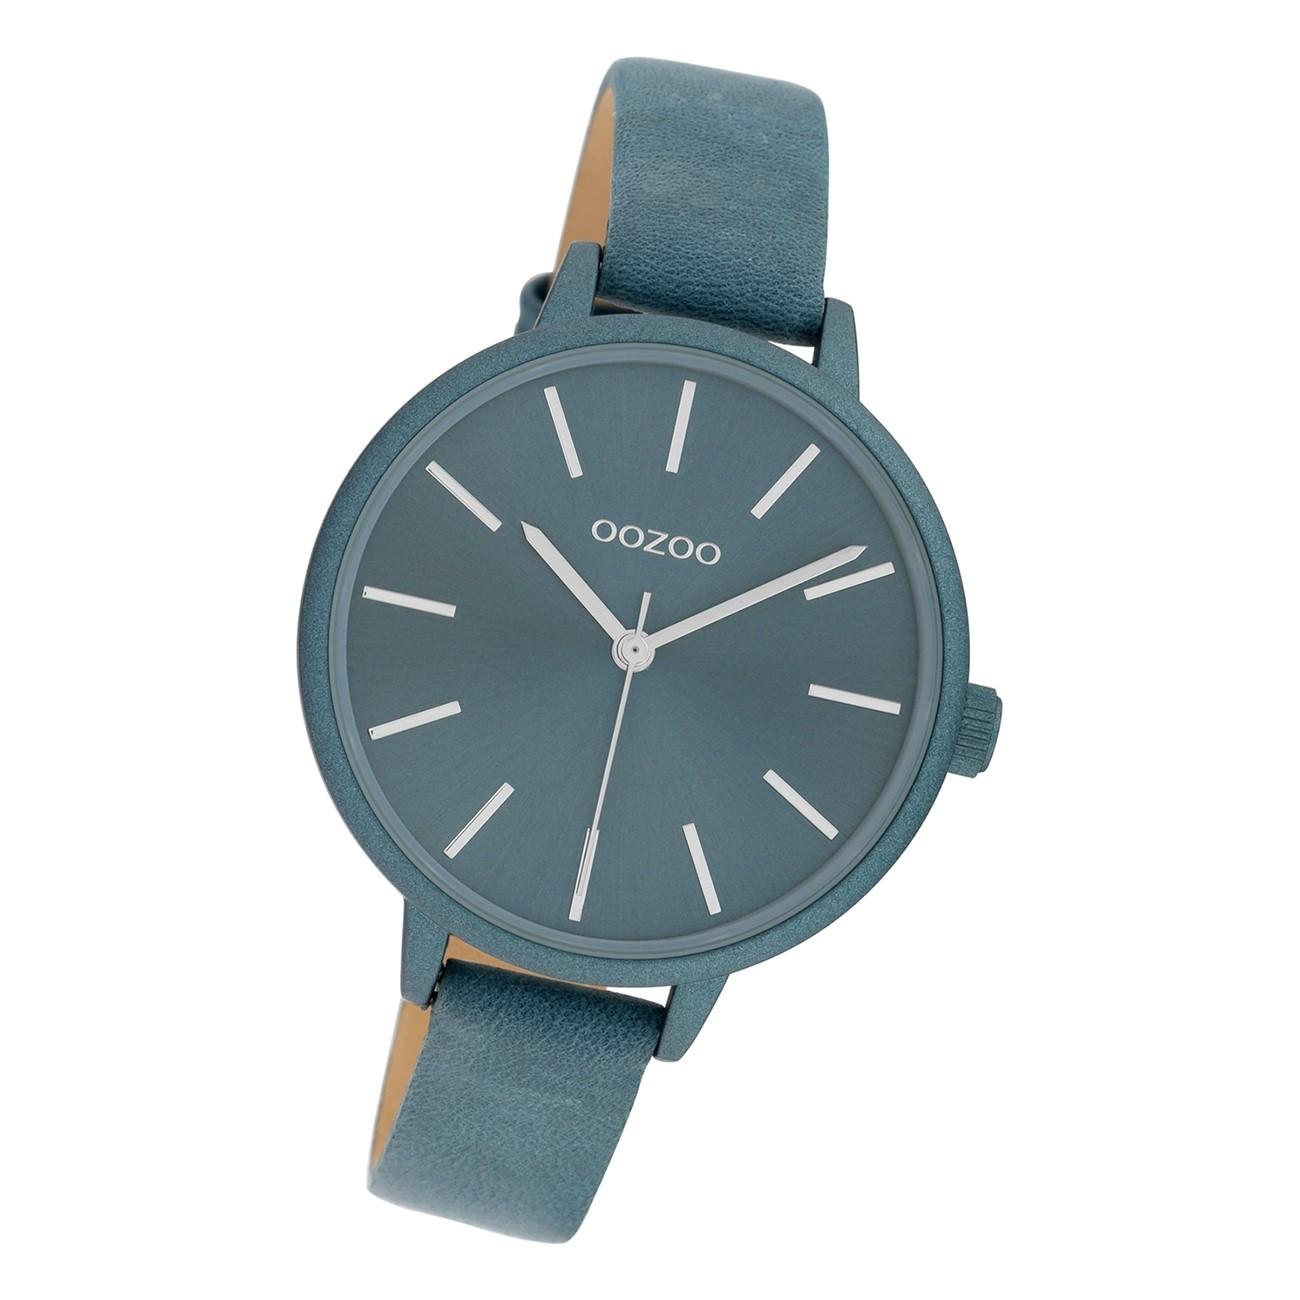 Oozoo Damen Armbanduhr Timepieces C10257 Analog Leder grau UOC10257